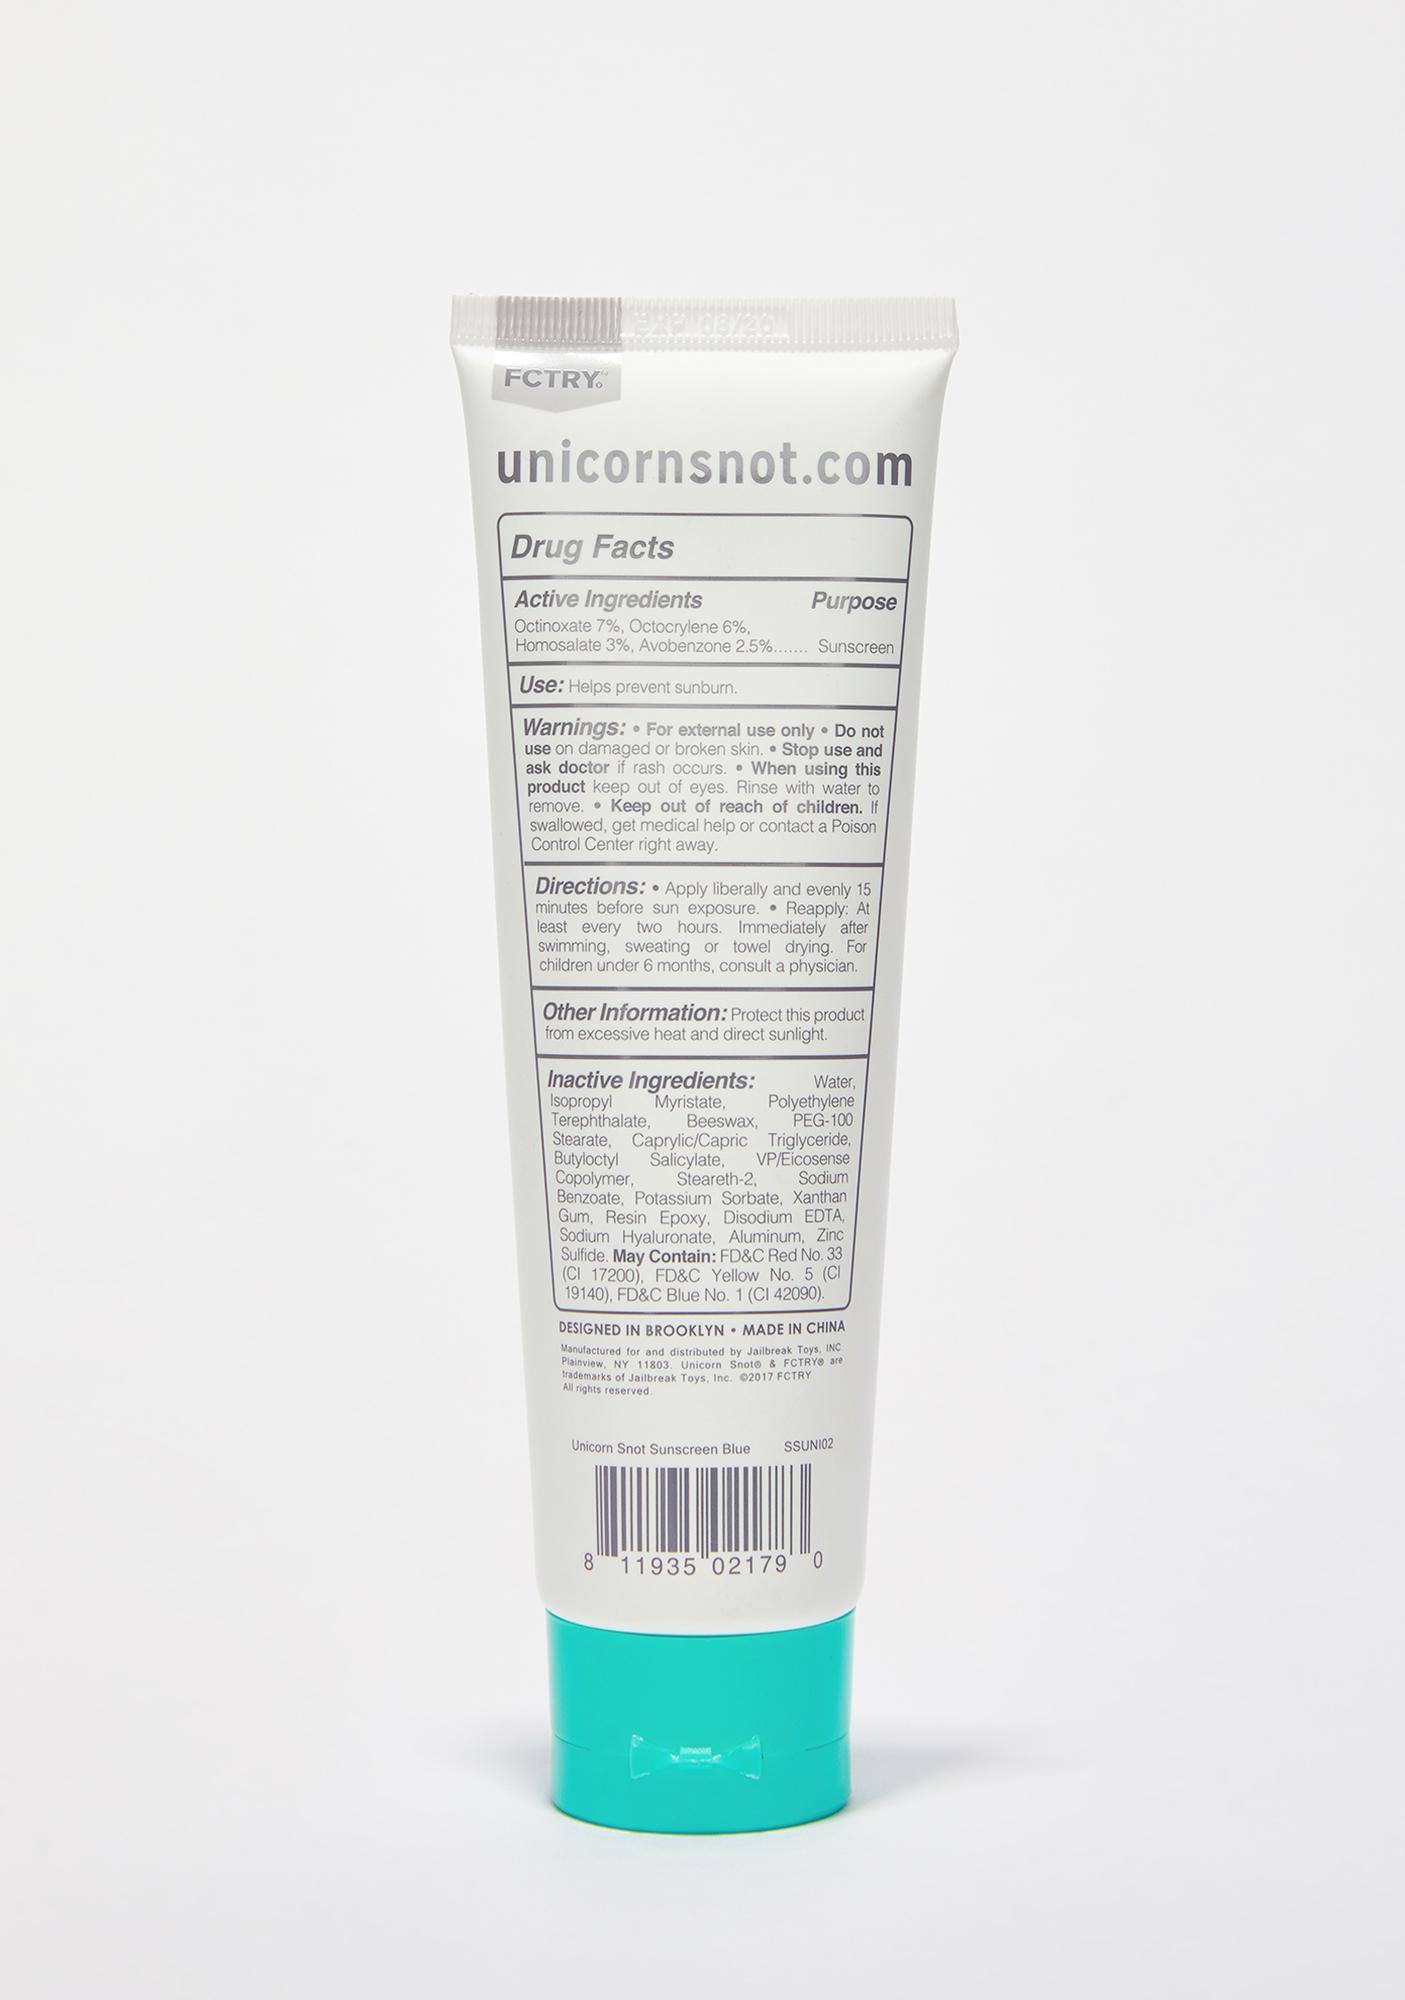 Unicorn Snot Blue Glitter Sunscreen